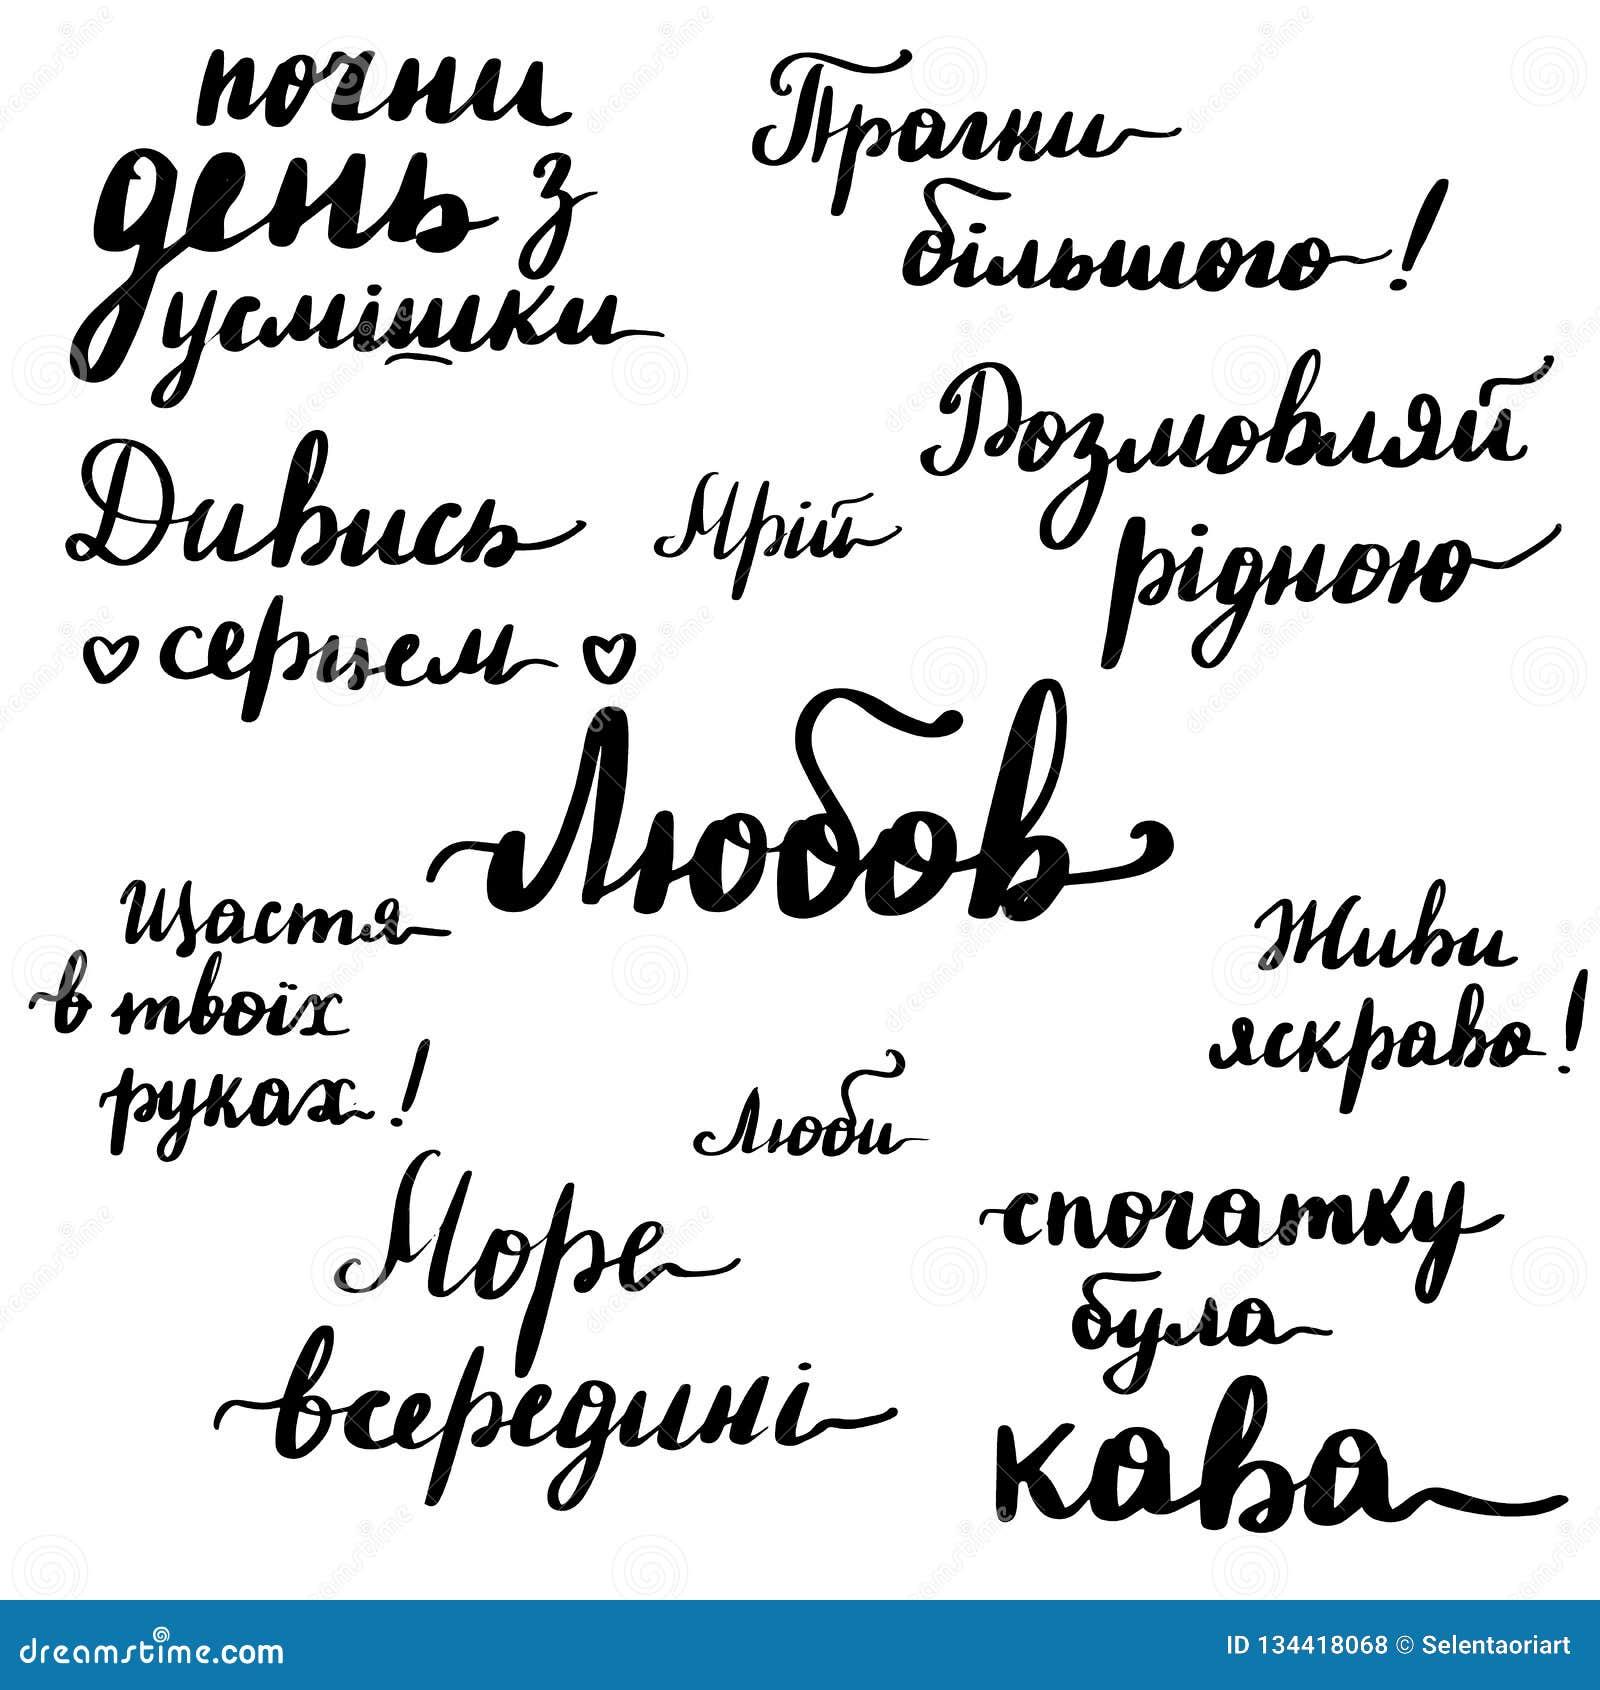 Ukrainian lettering motivating quotes written